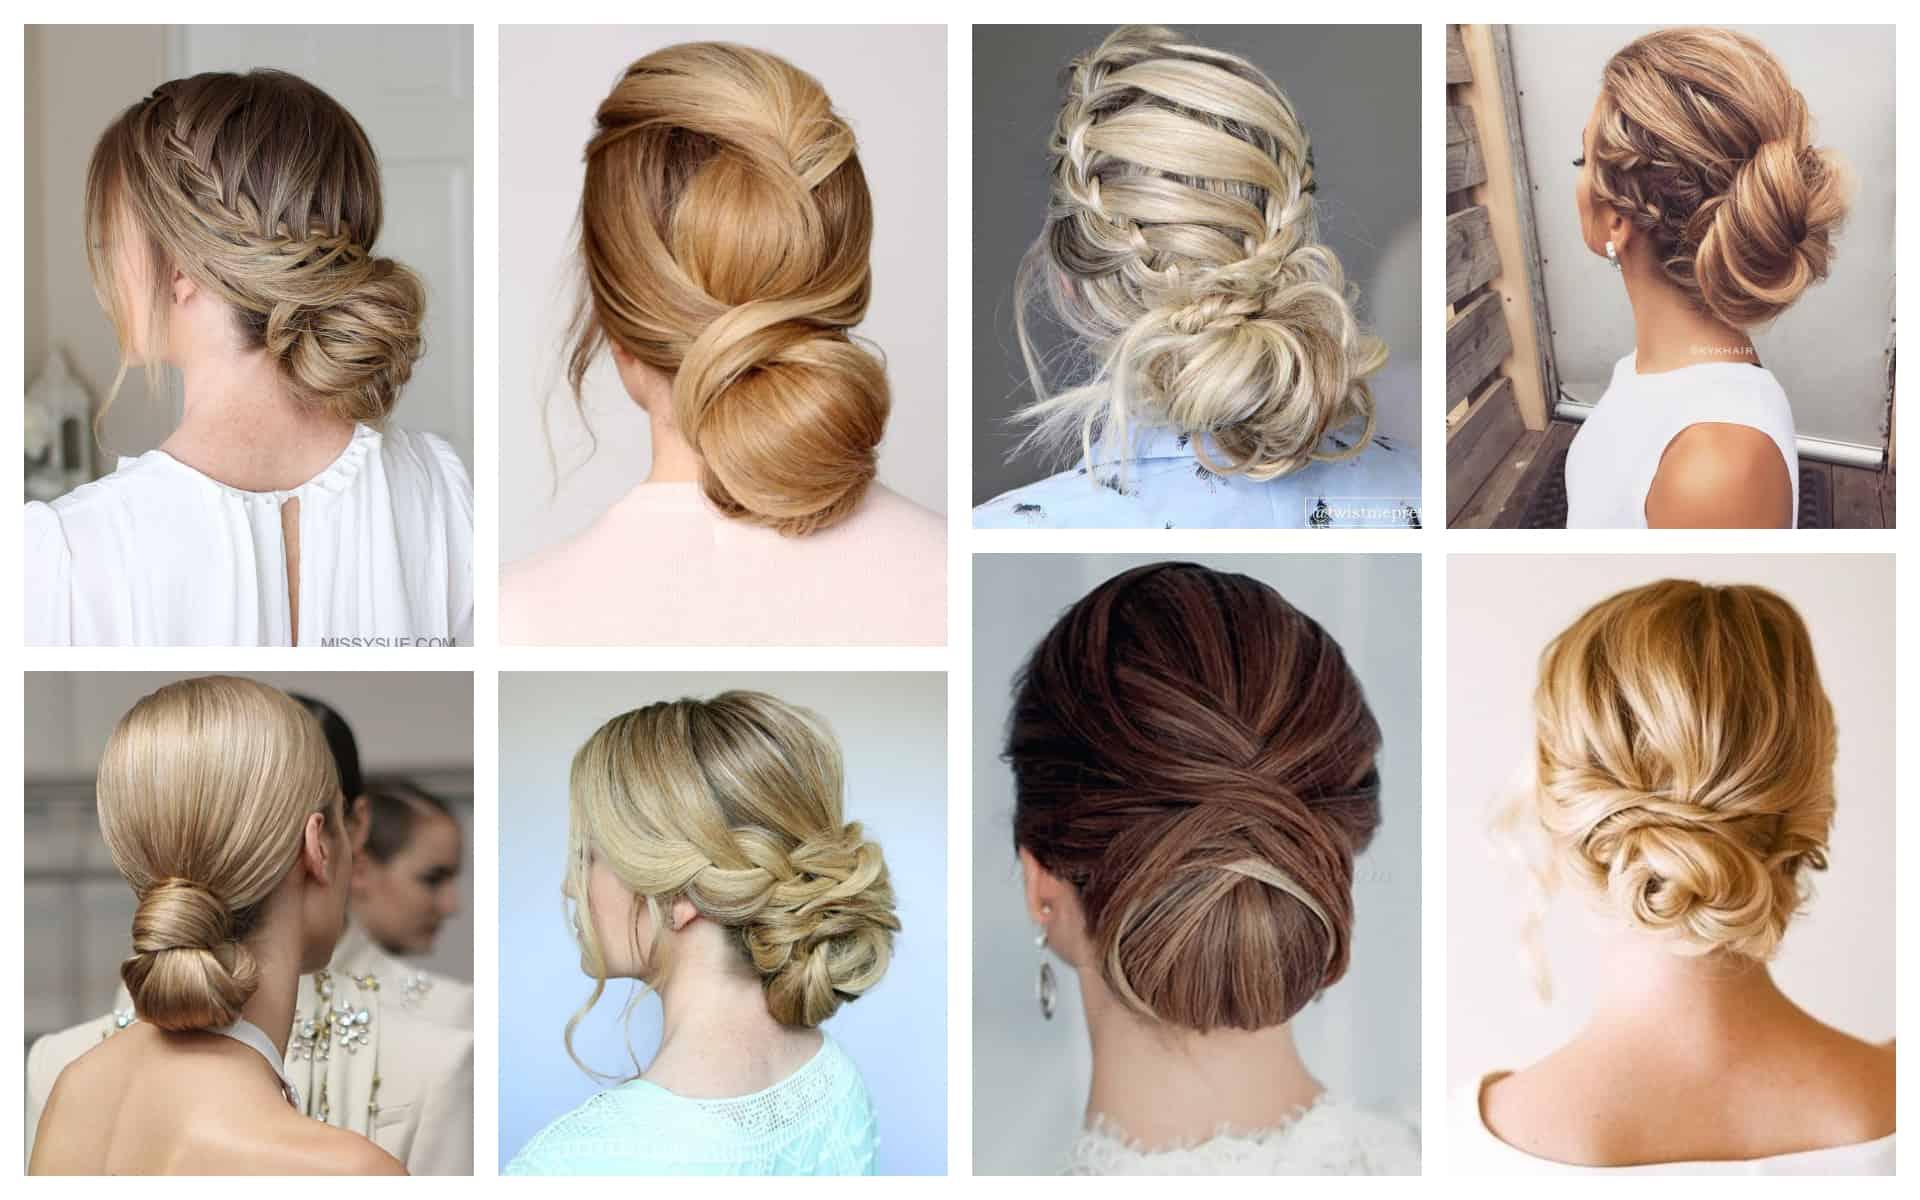 Elegant Low Bun Hairstyles That Will Make You Look ...